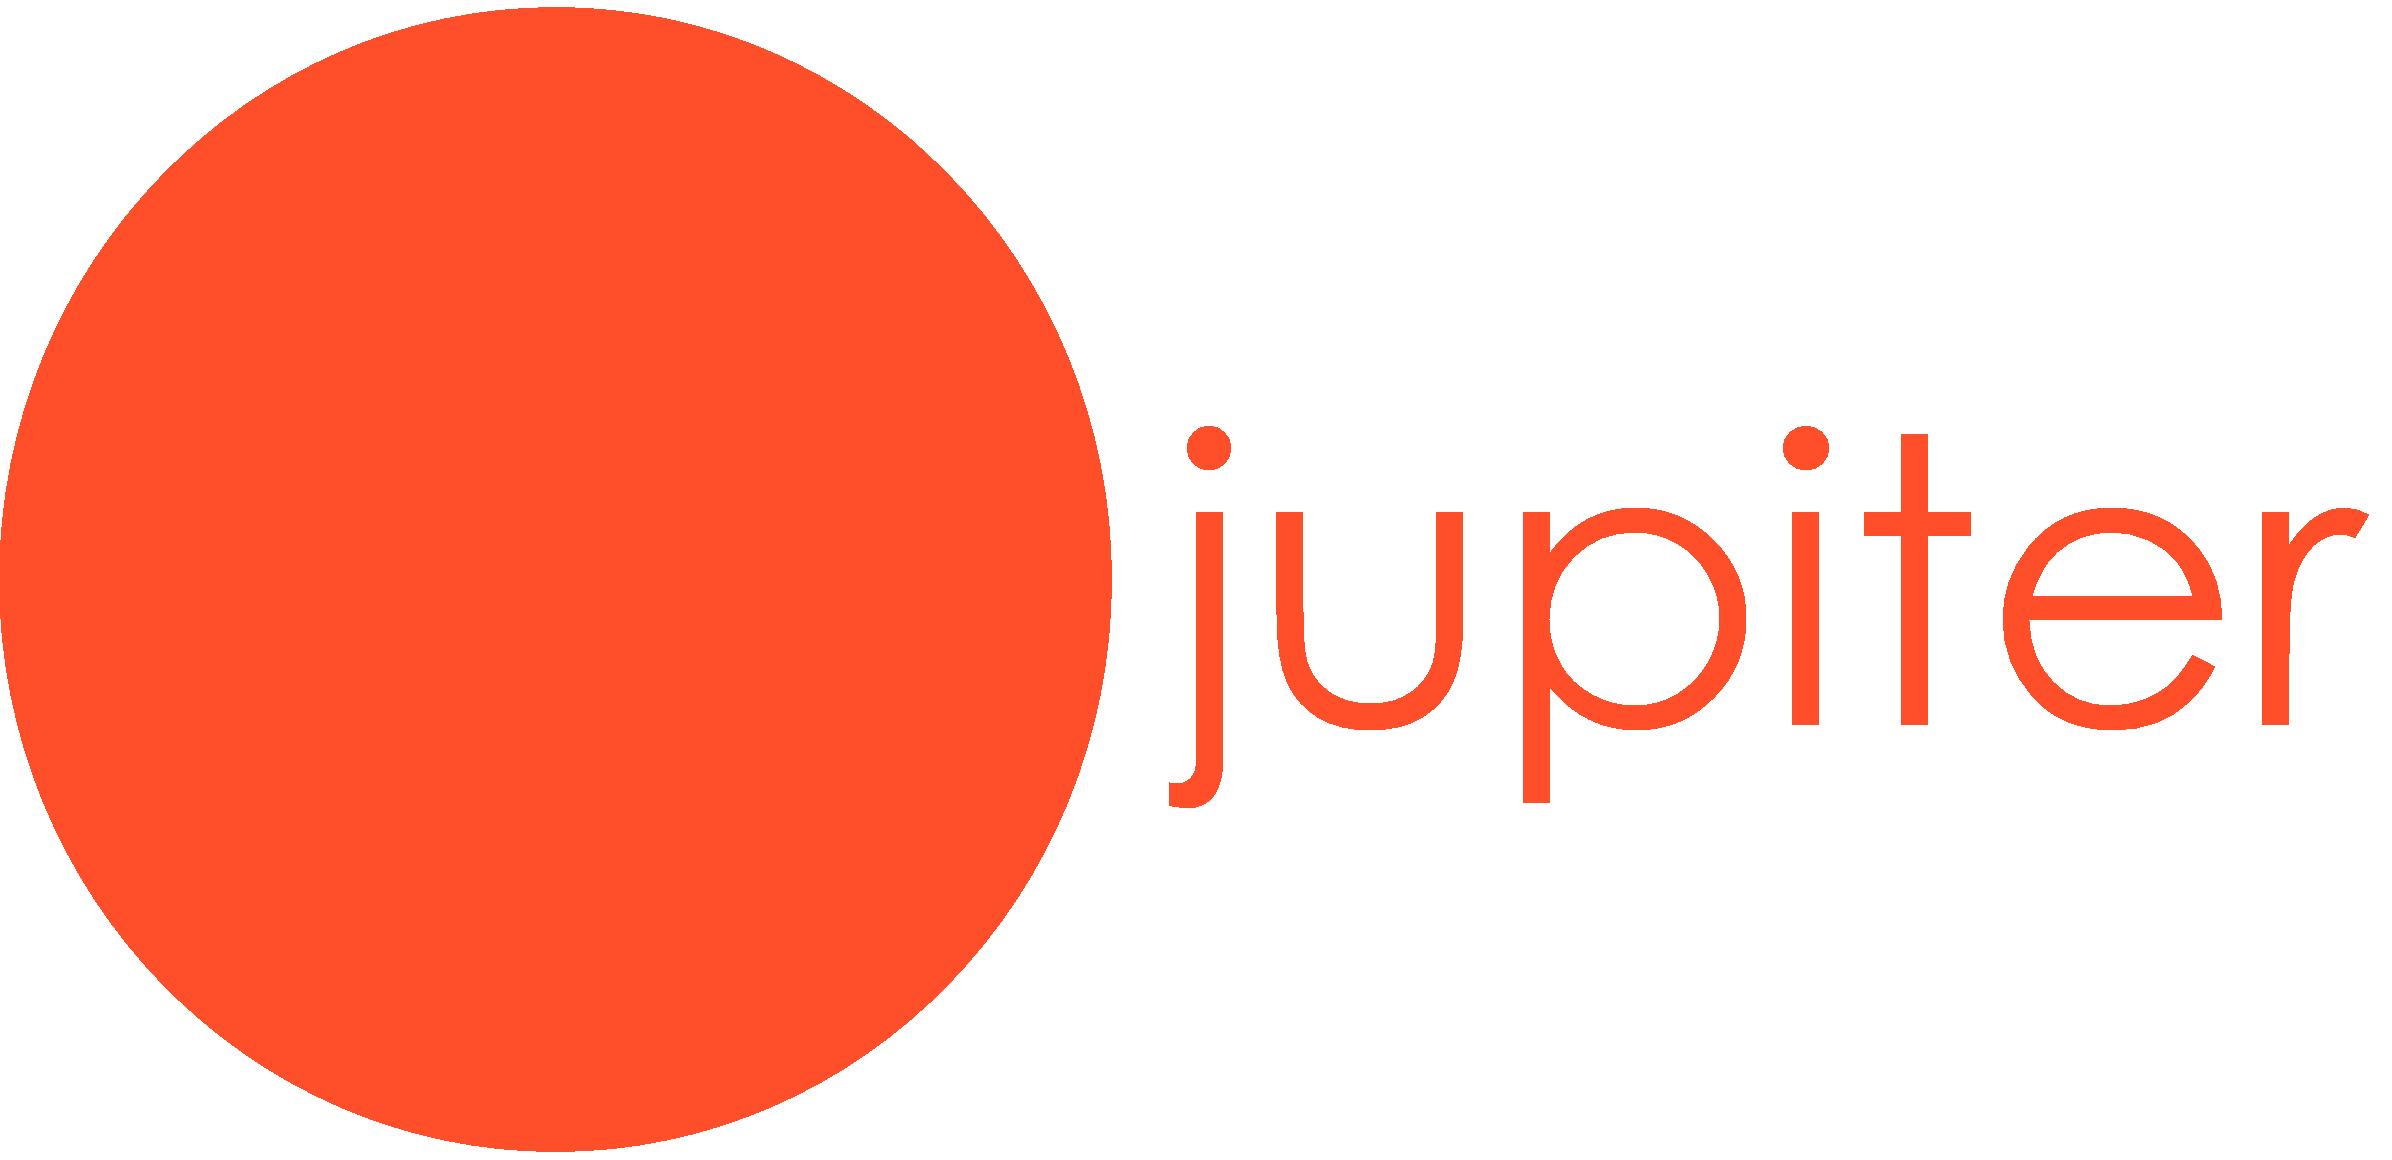 Jupiter Television Network